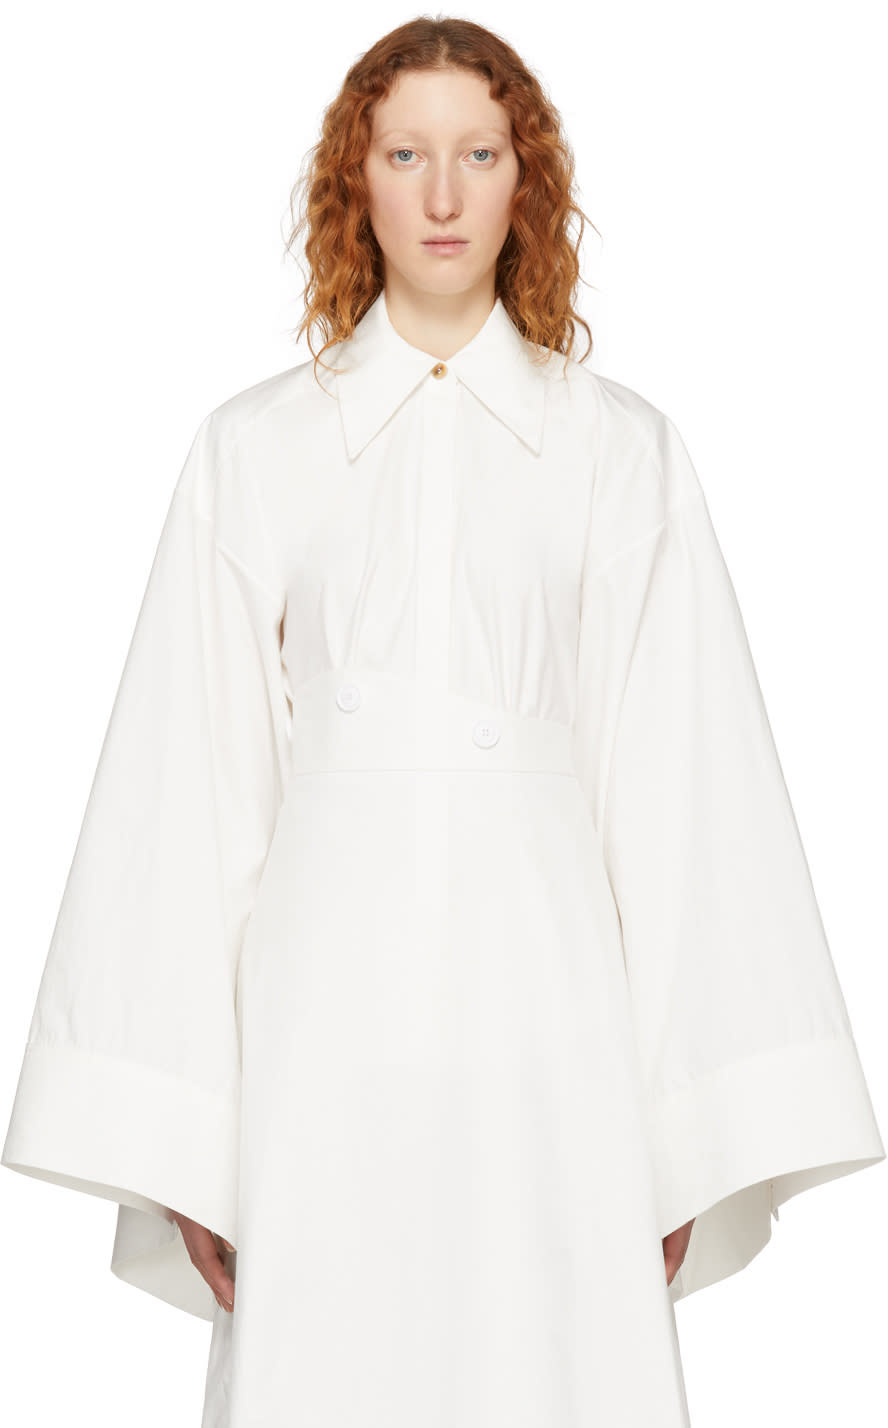 A.w.a.k.e. Chemise Blanche Kimono Sleeve